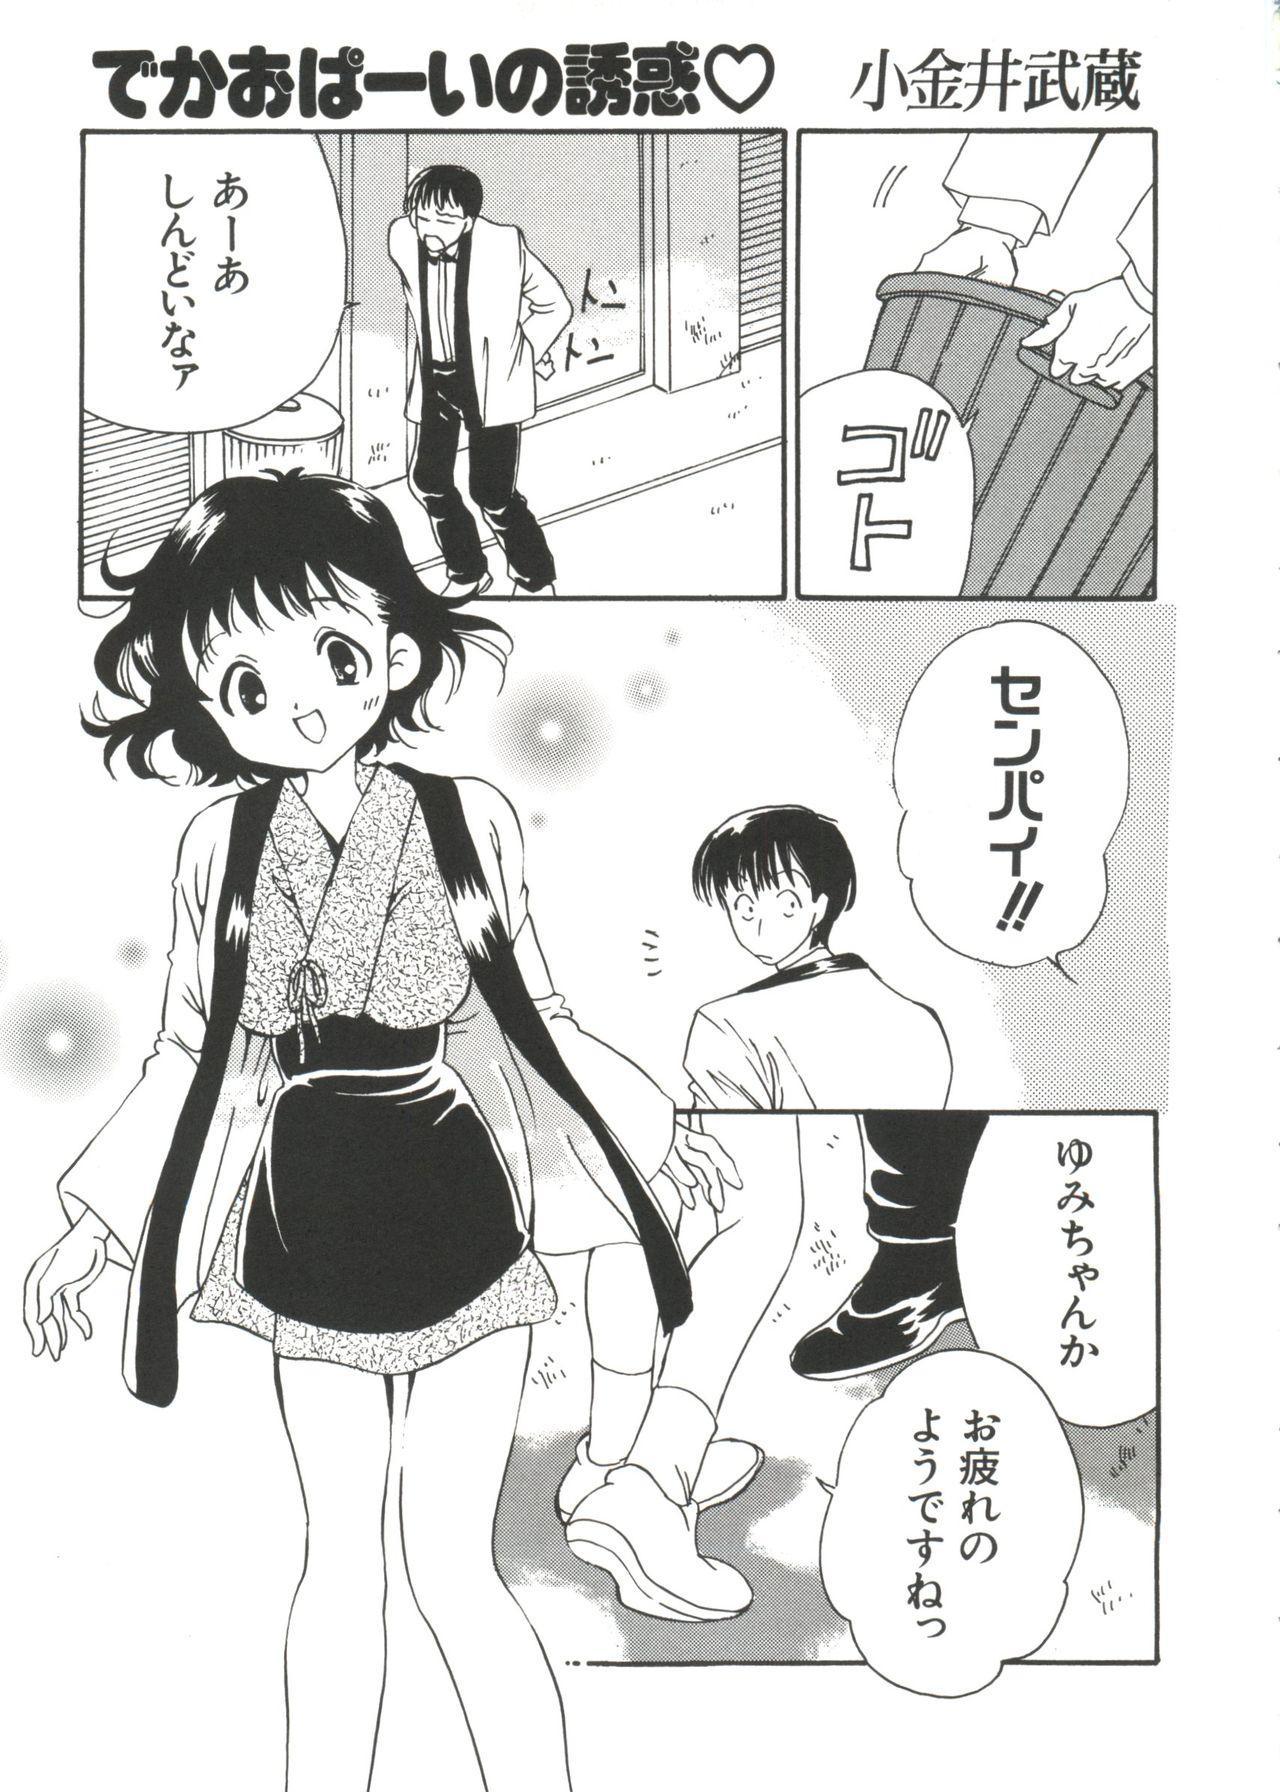 Naru Hina Z 2 54